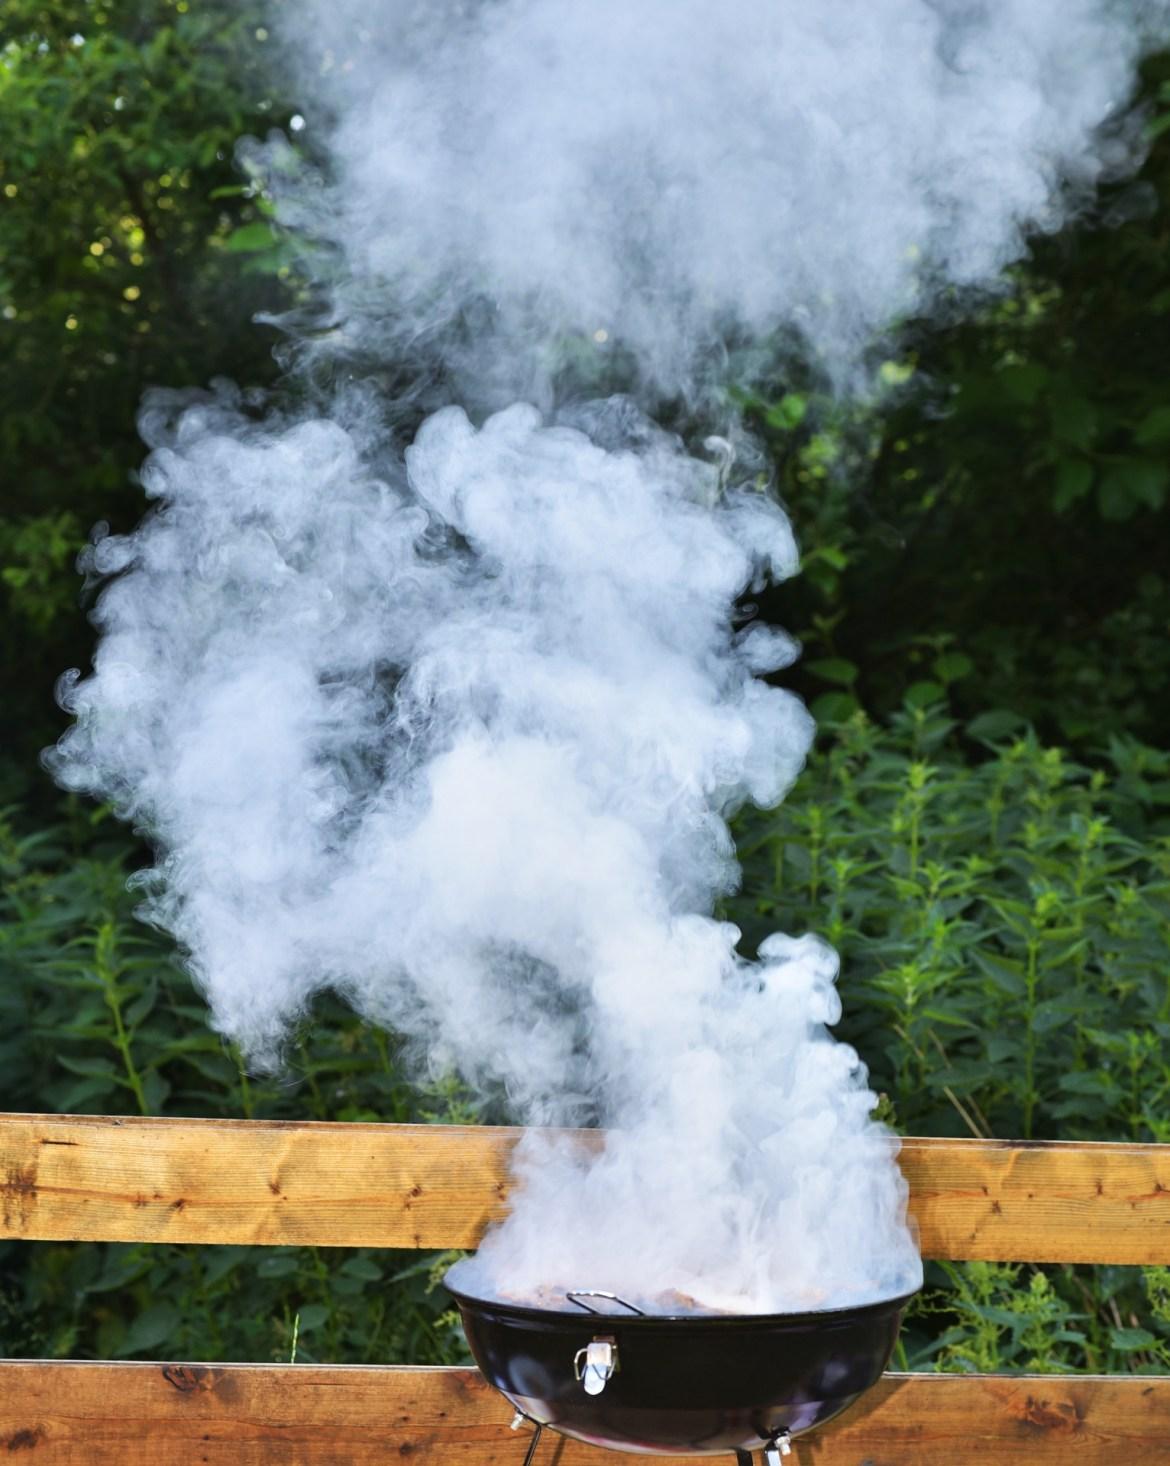 using smoker grills